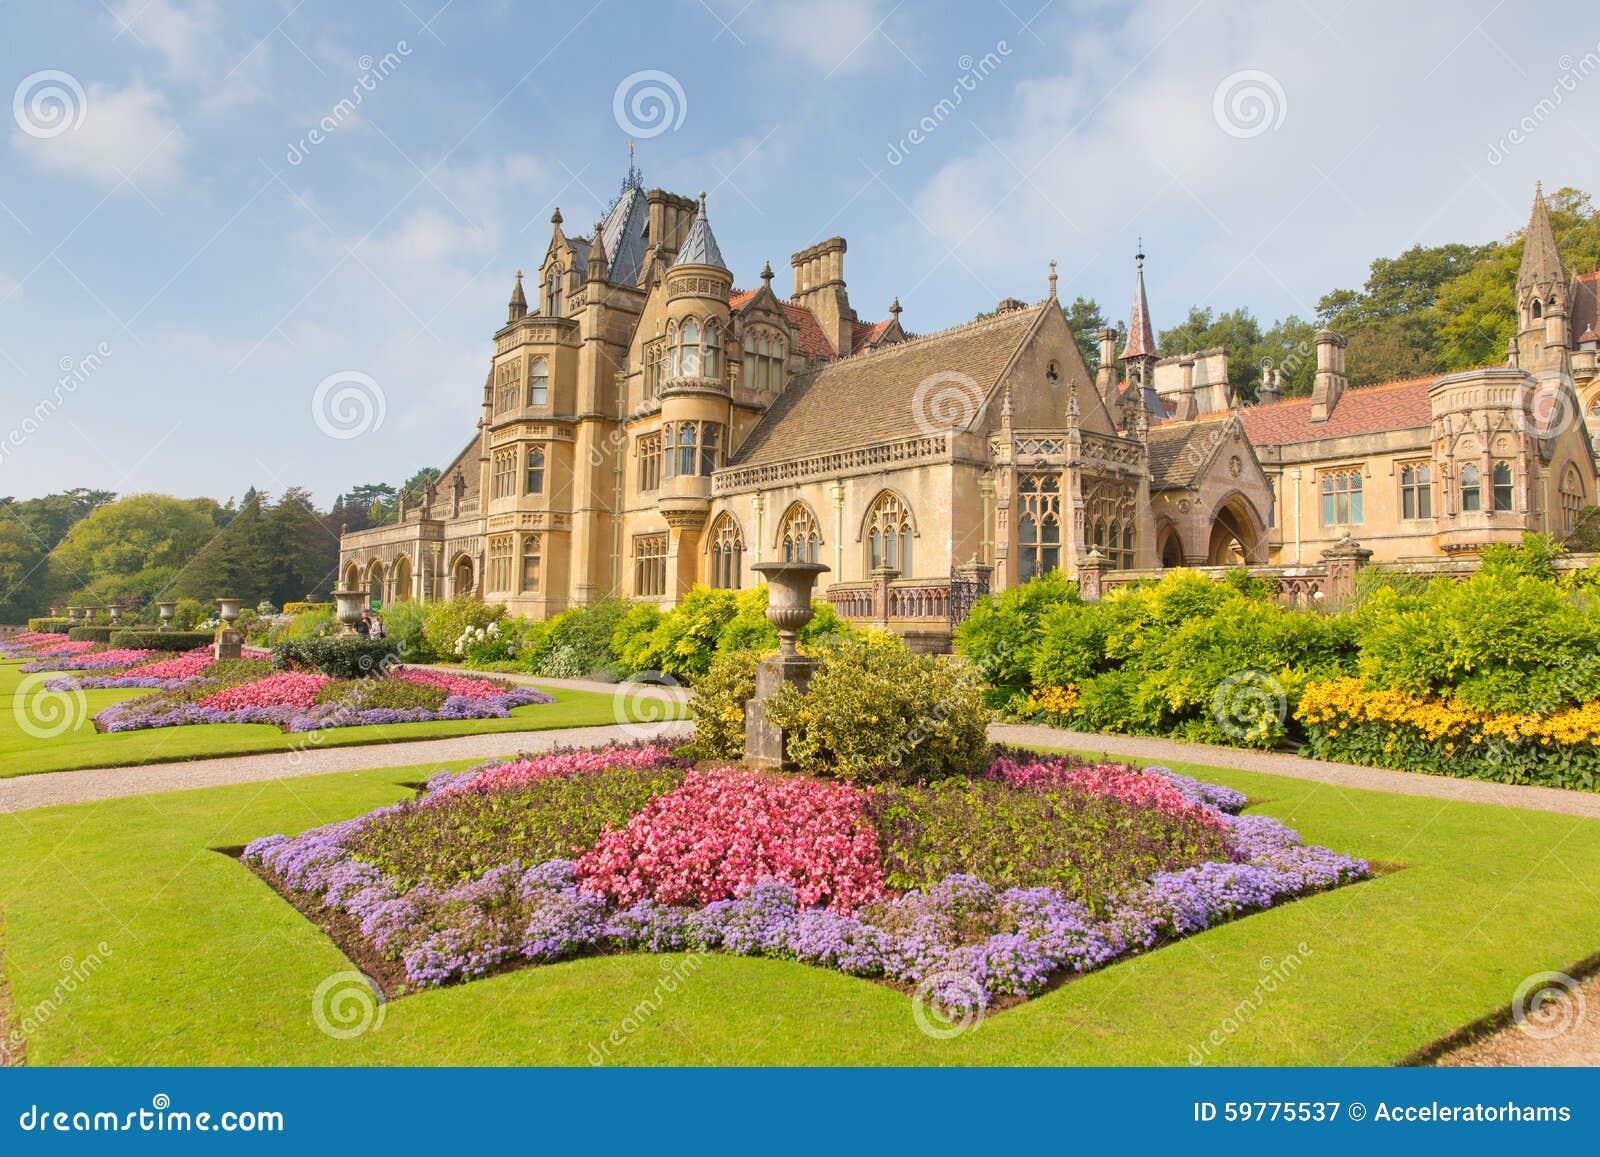 Tyntesfield House Wraxhall North Somerset England Uk